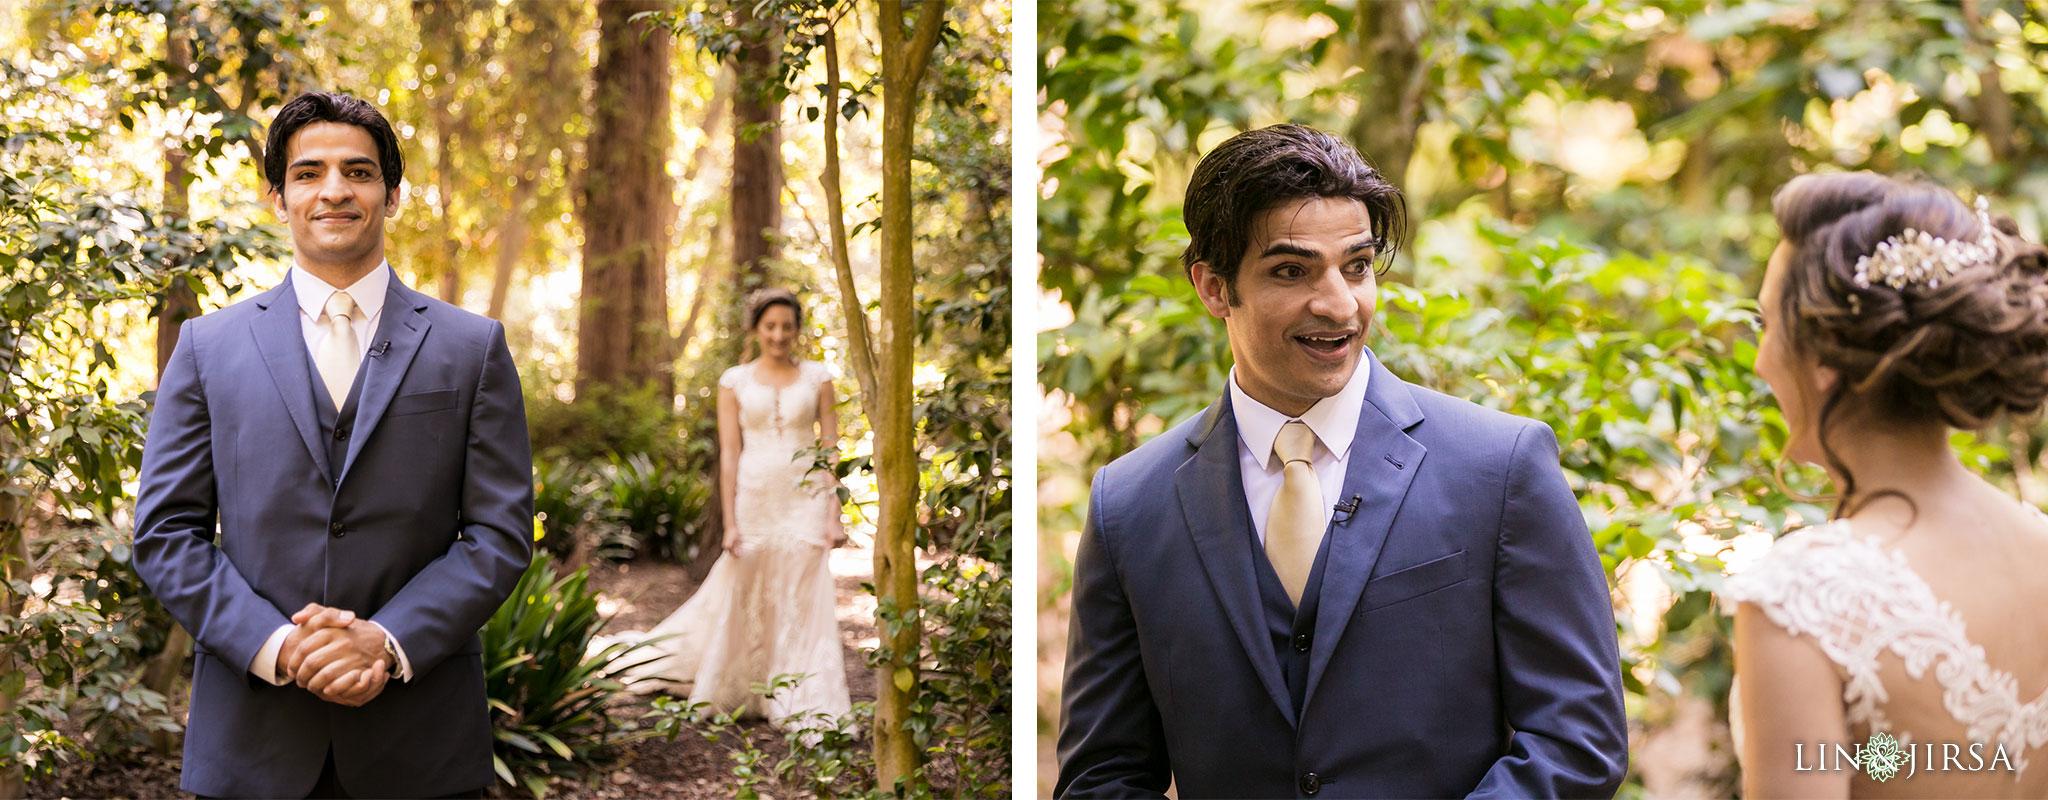 009 taglyan complex los angeles persian wedding photography